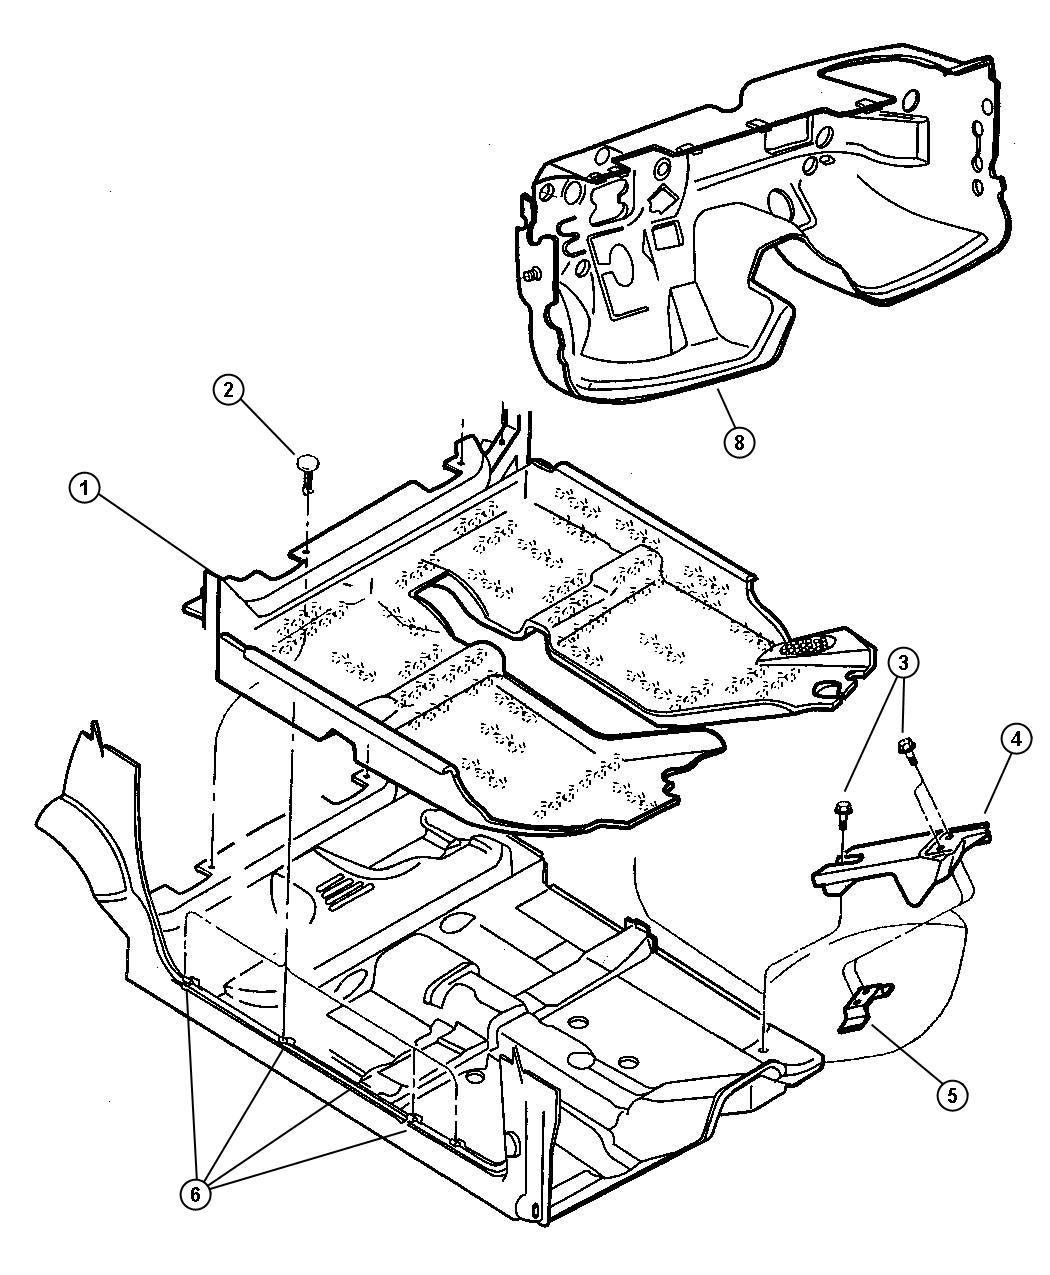 2000 Dodge Grand Caravan Clip  Nameplate  Nut  Dash Panel  Silencer Attaching  Push On  500